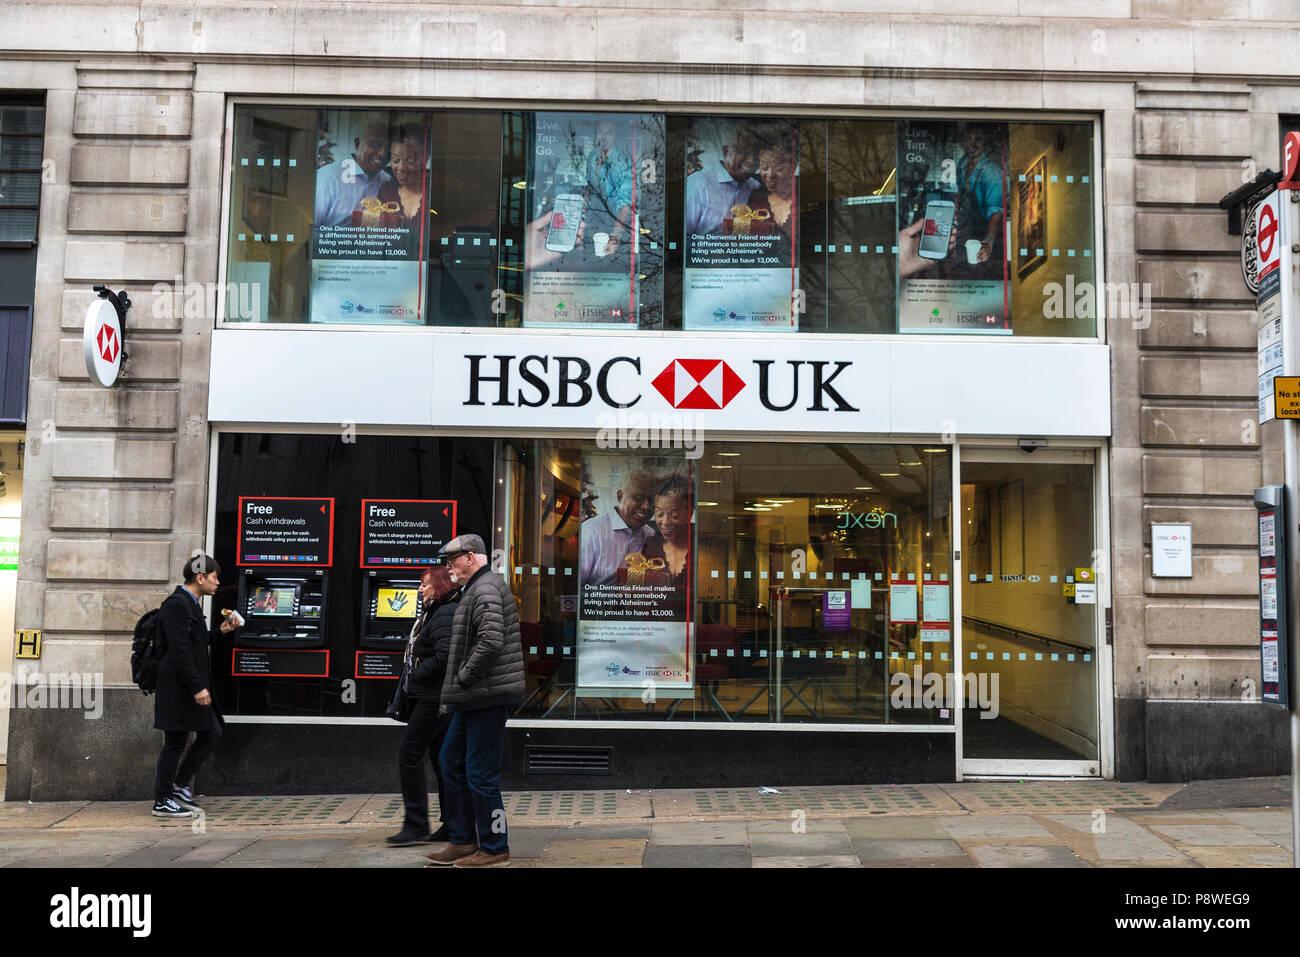 Hsbc Bank Branch In City Stock Photos & Hsbc Bank Branch ...